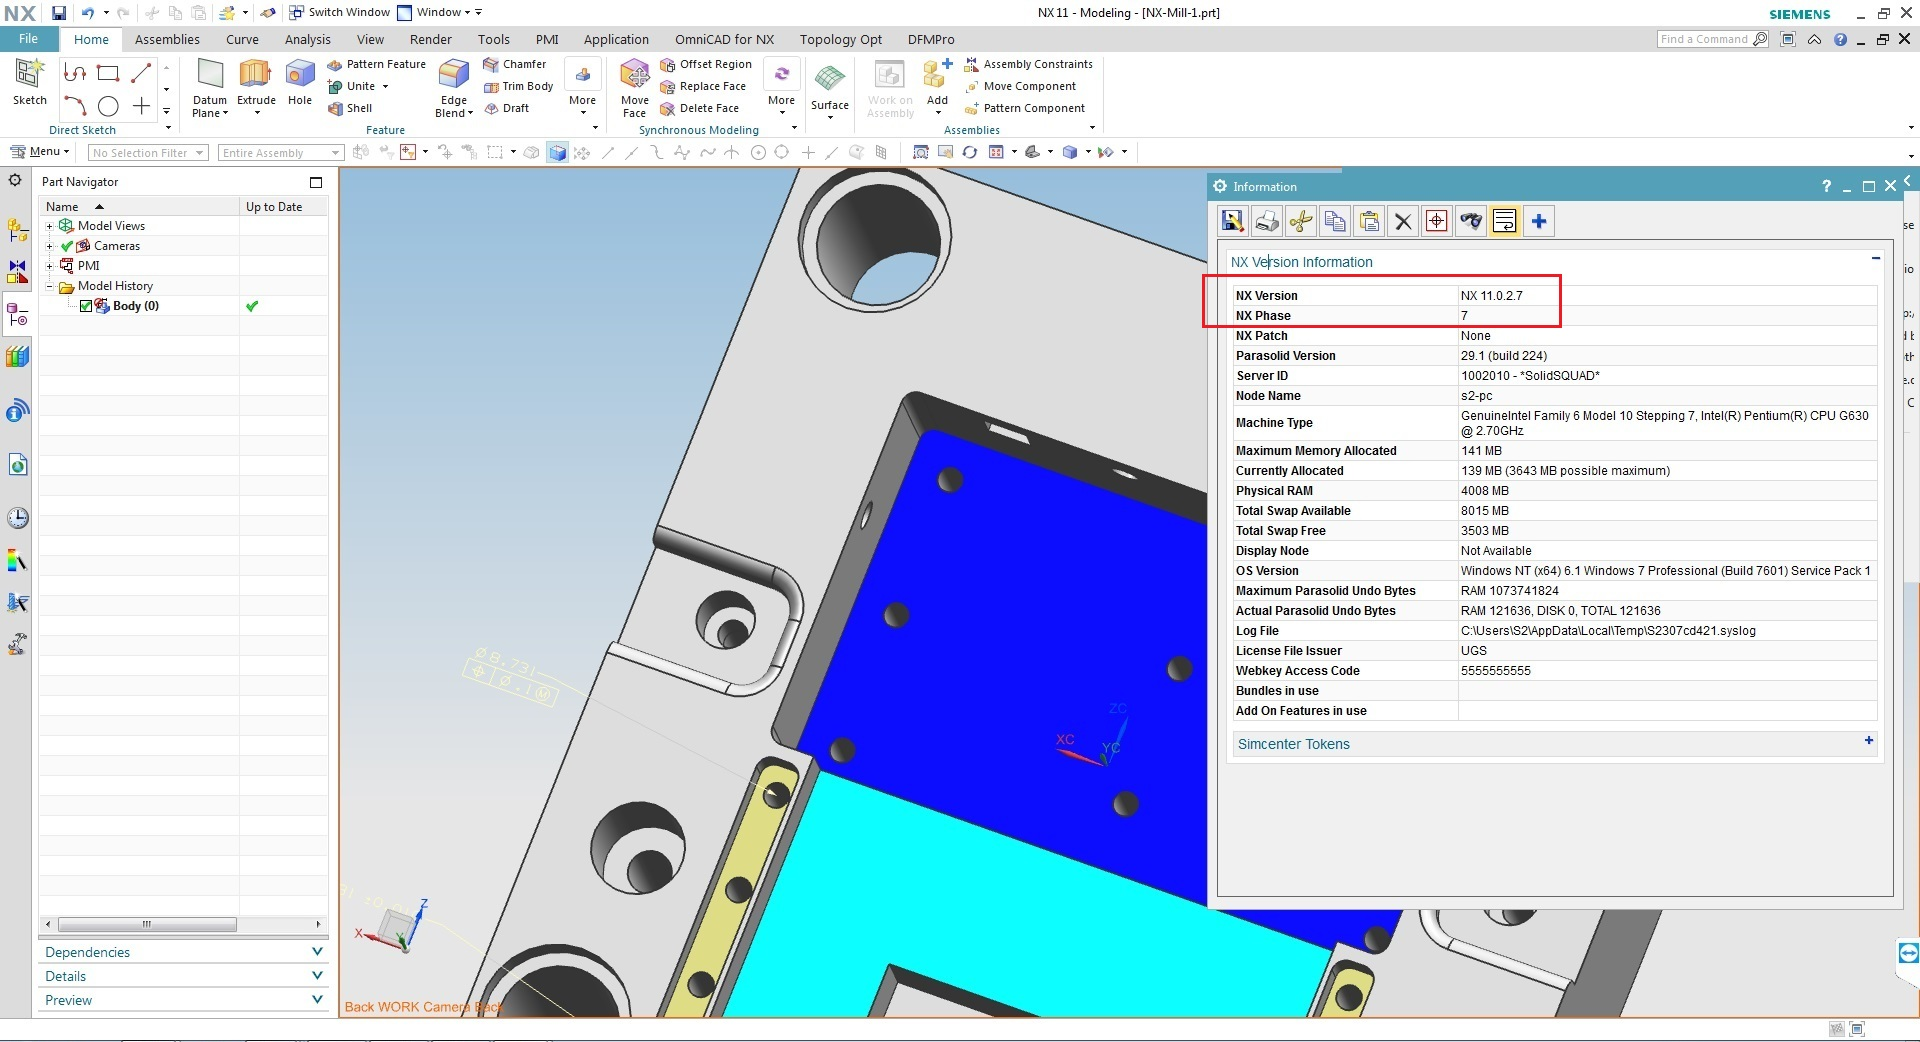 Design with Siemens PLM NX 11.0.2 update win64 full